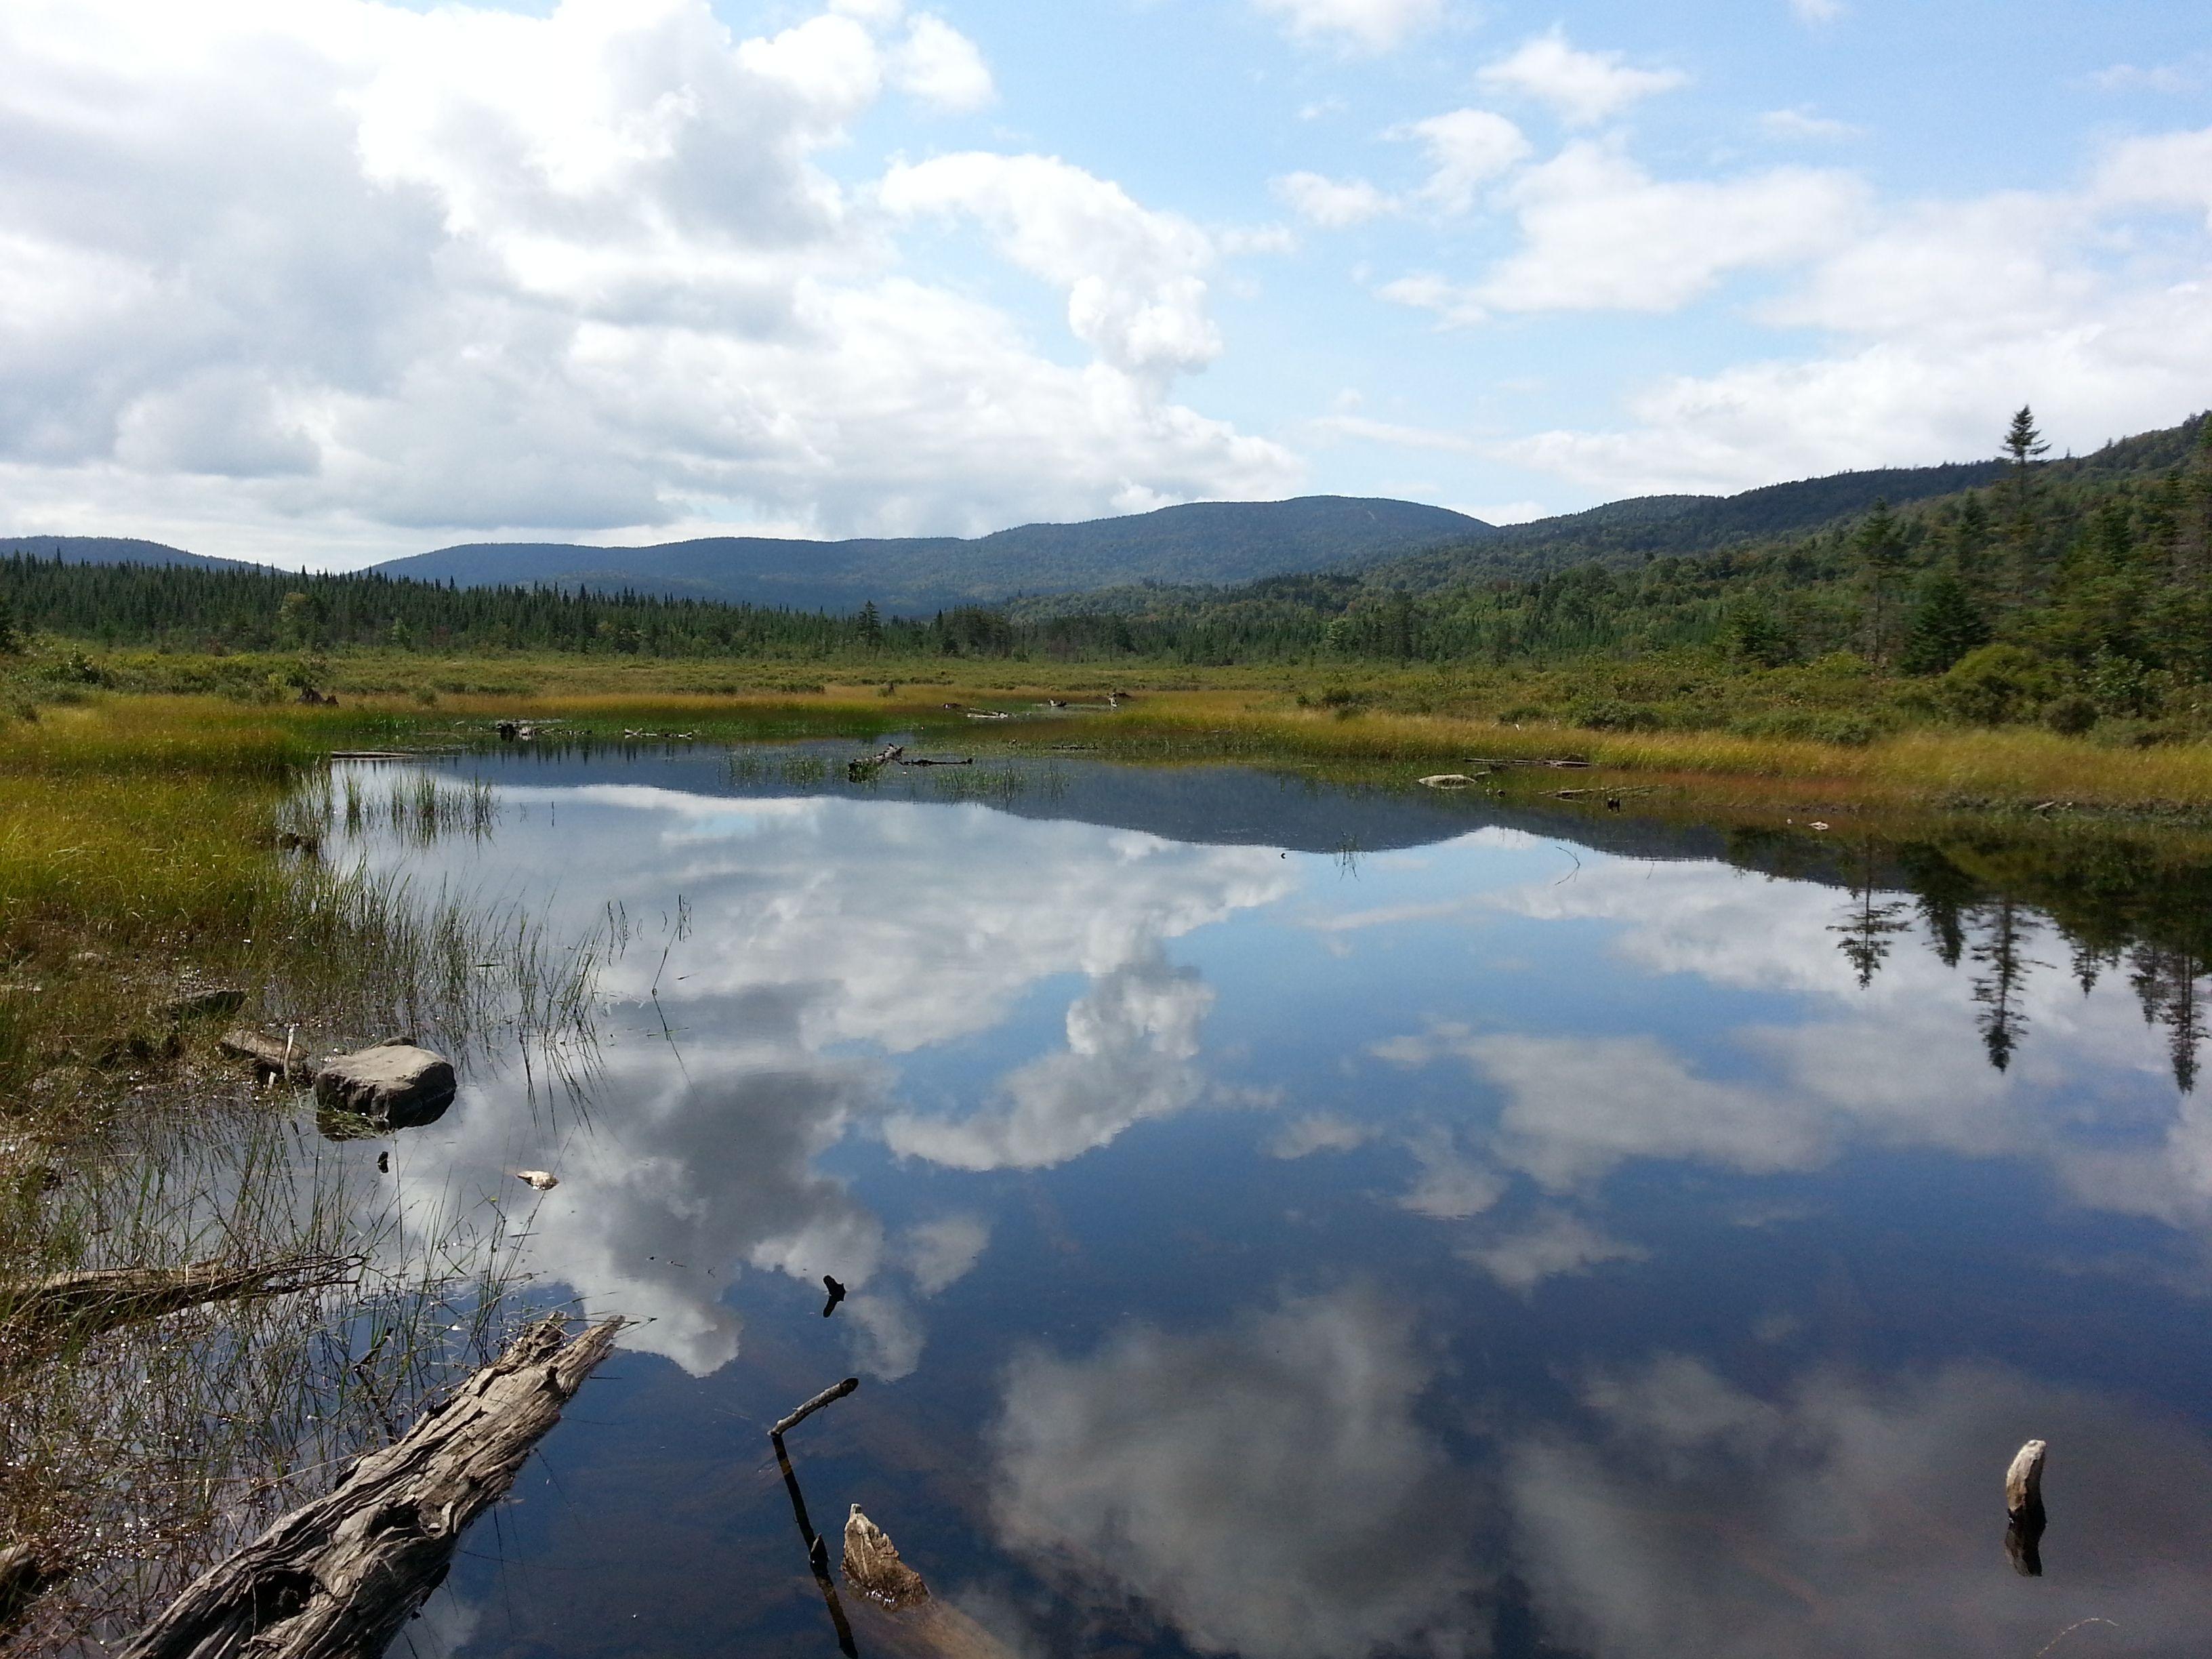 Rhubarb Pond Pittsburg Nh Fly Fishing Upper Conn